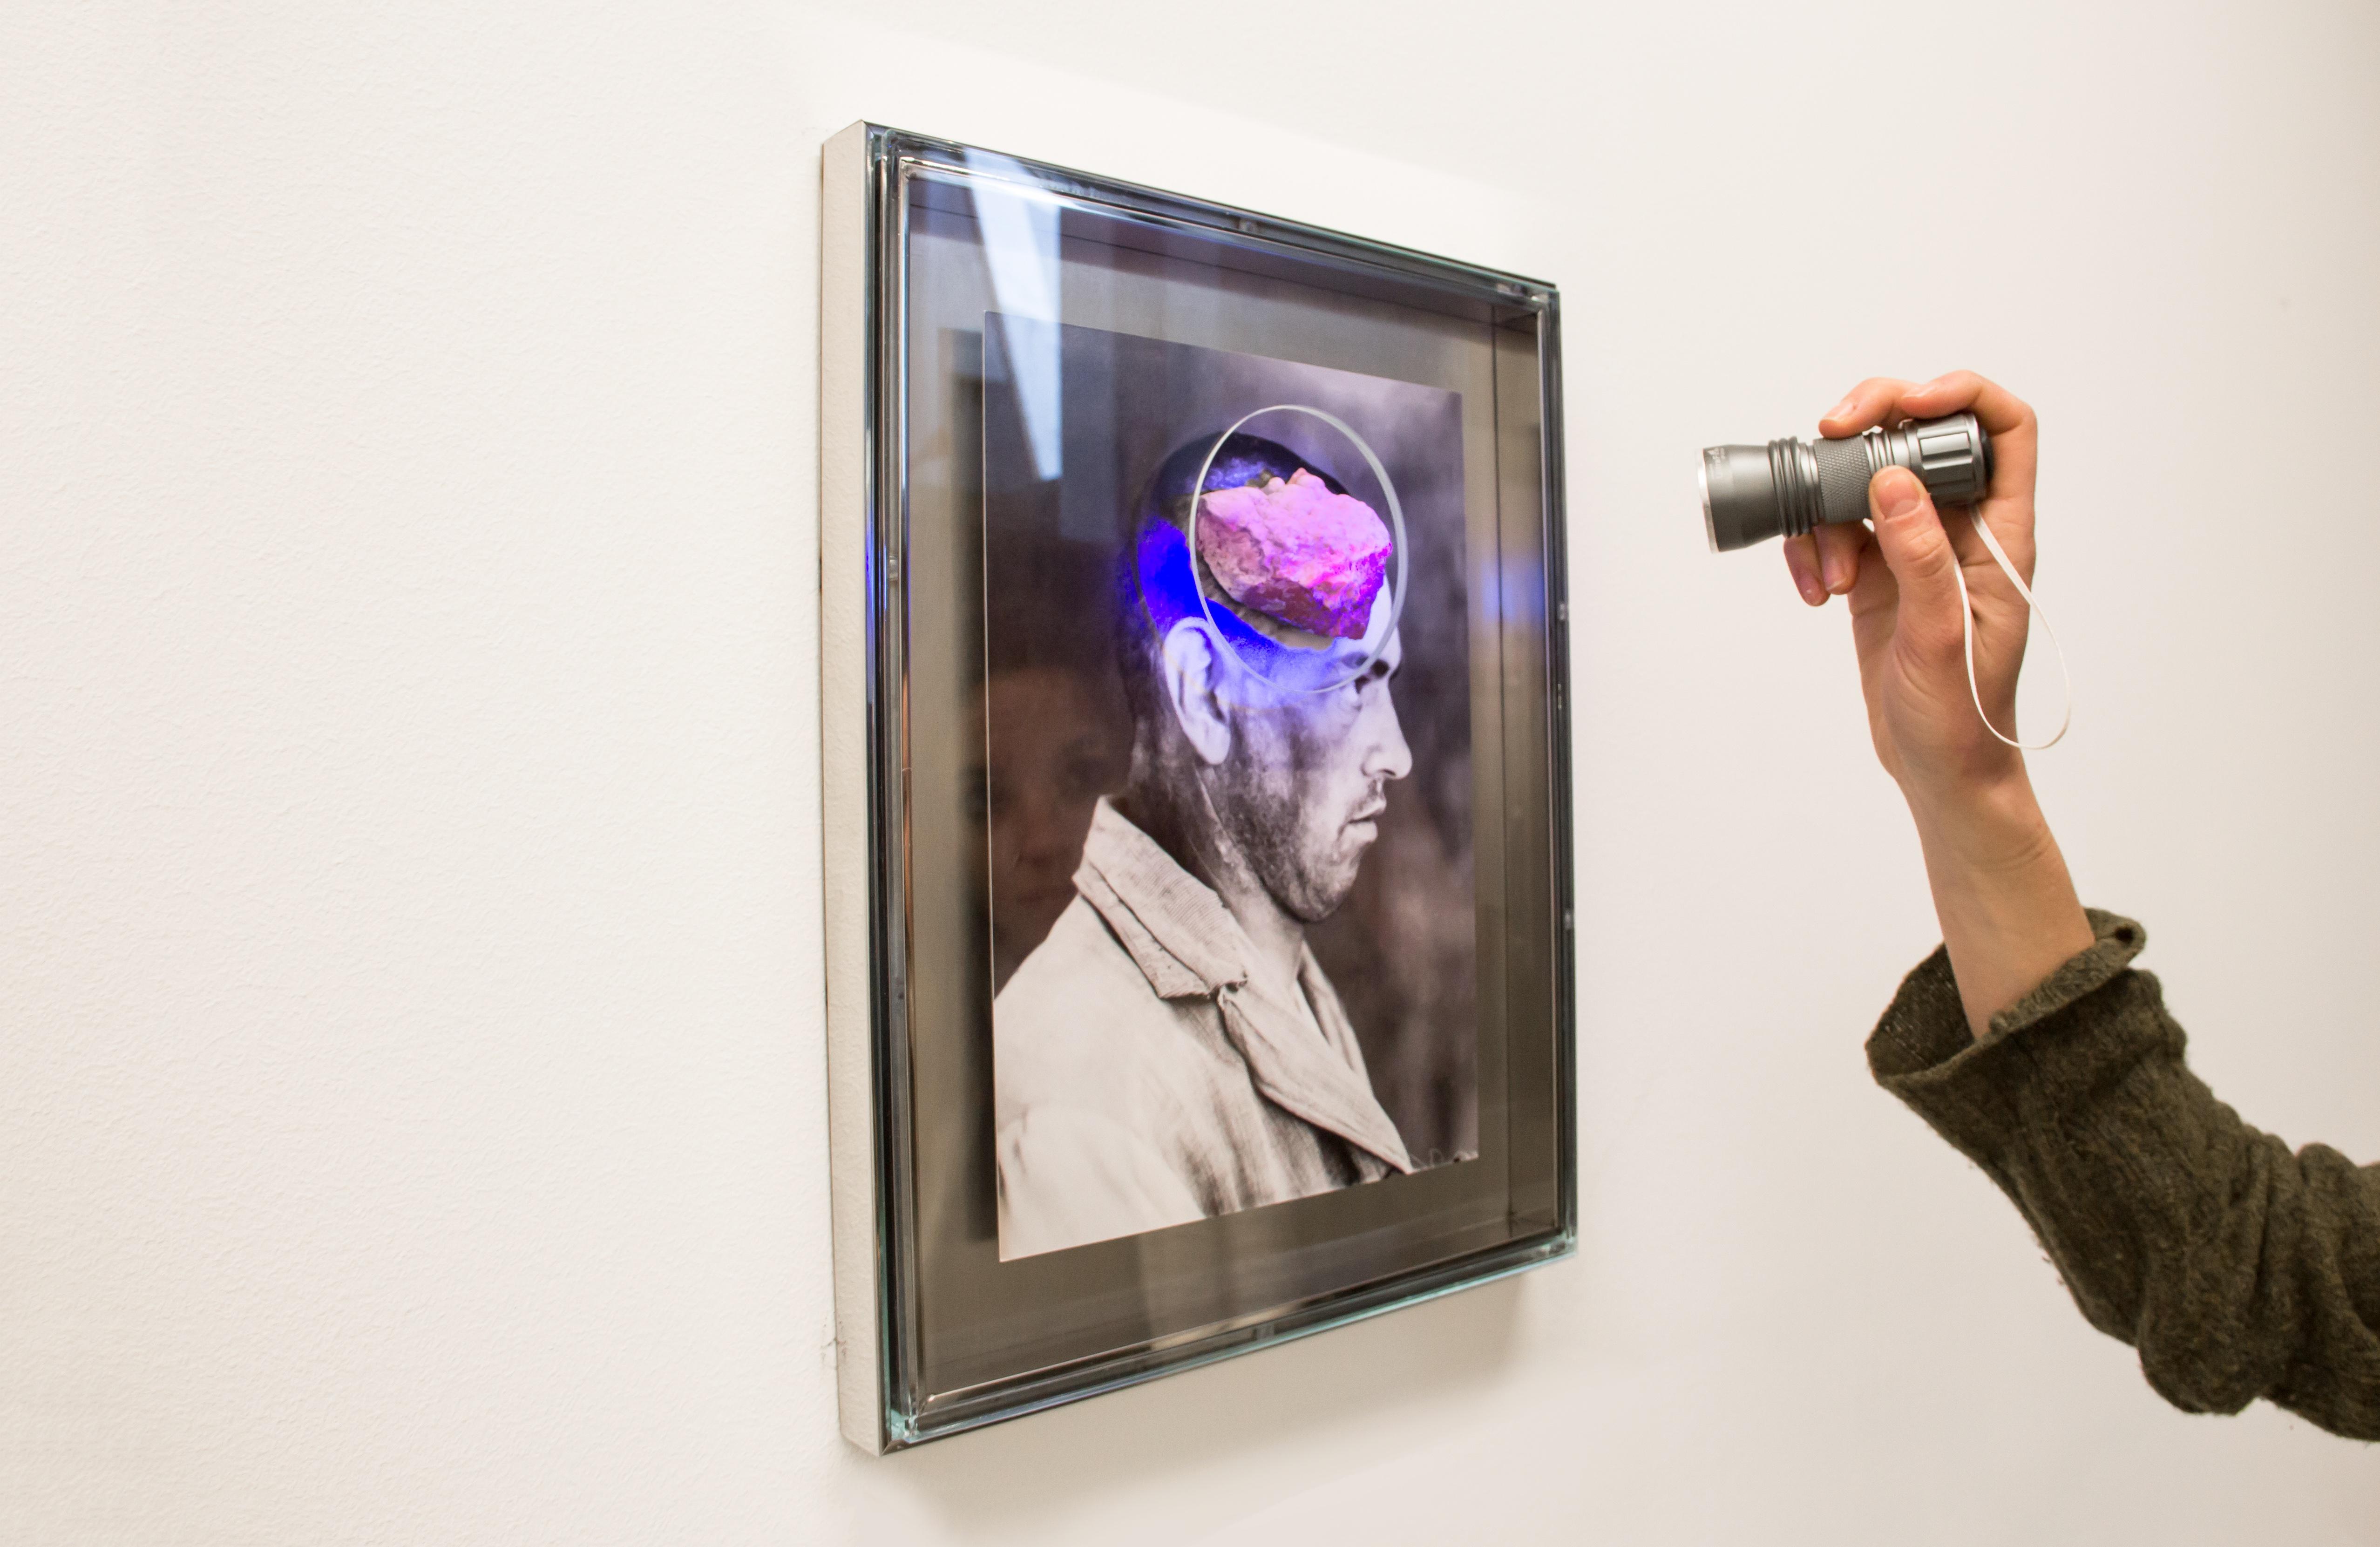 """Nootropic"", 2018, Installazione, pietra, foto d'archivio, acciaio, vetro, luce UV, 40 x 30 cm. Courtesy Galerie Alberta Pane"